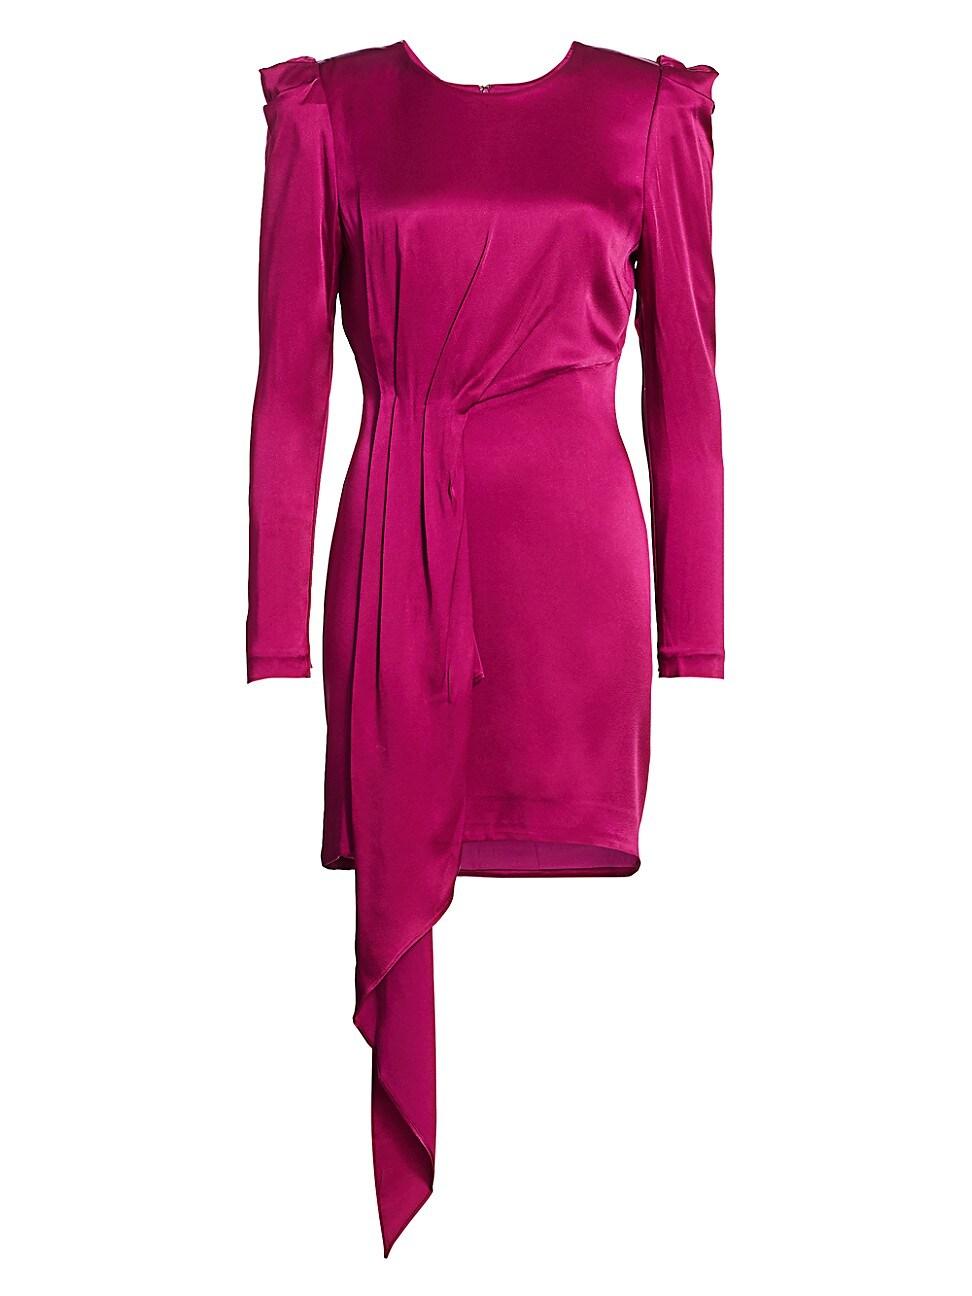 Haney WOMEN'S SOFIA PUFF-SHOULDER MINI DRESS